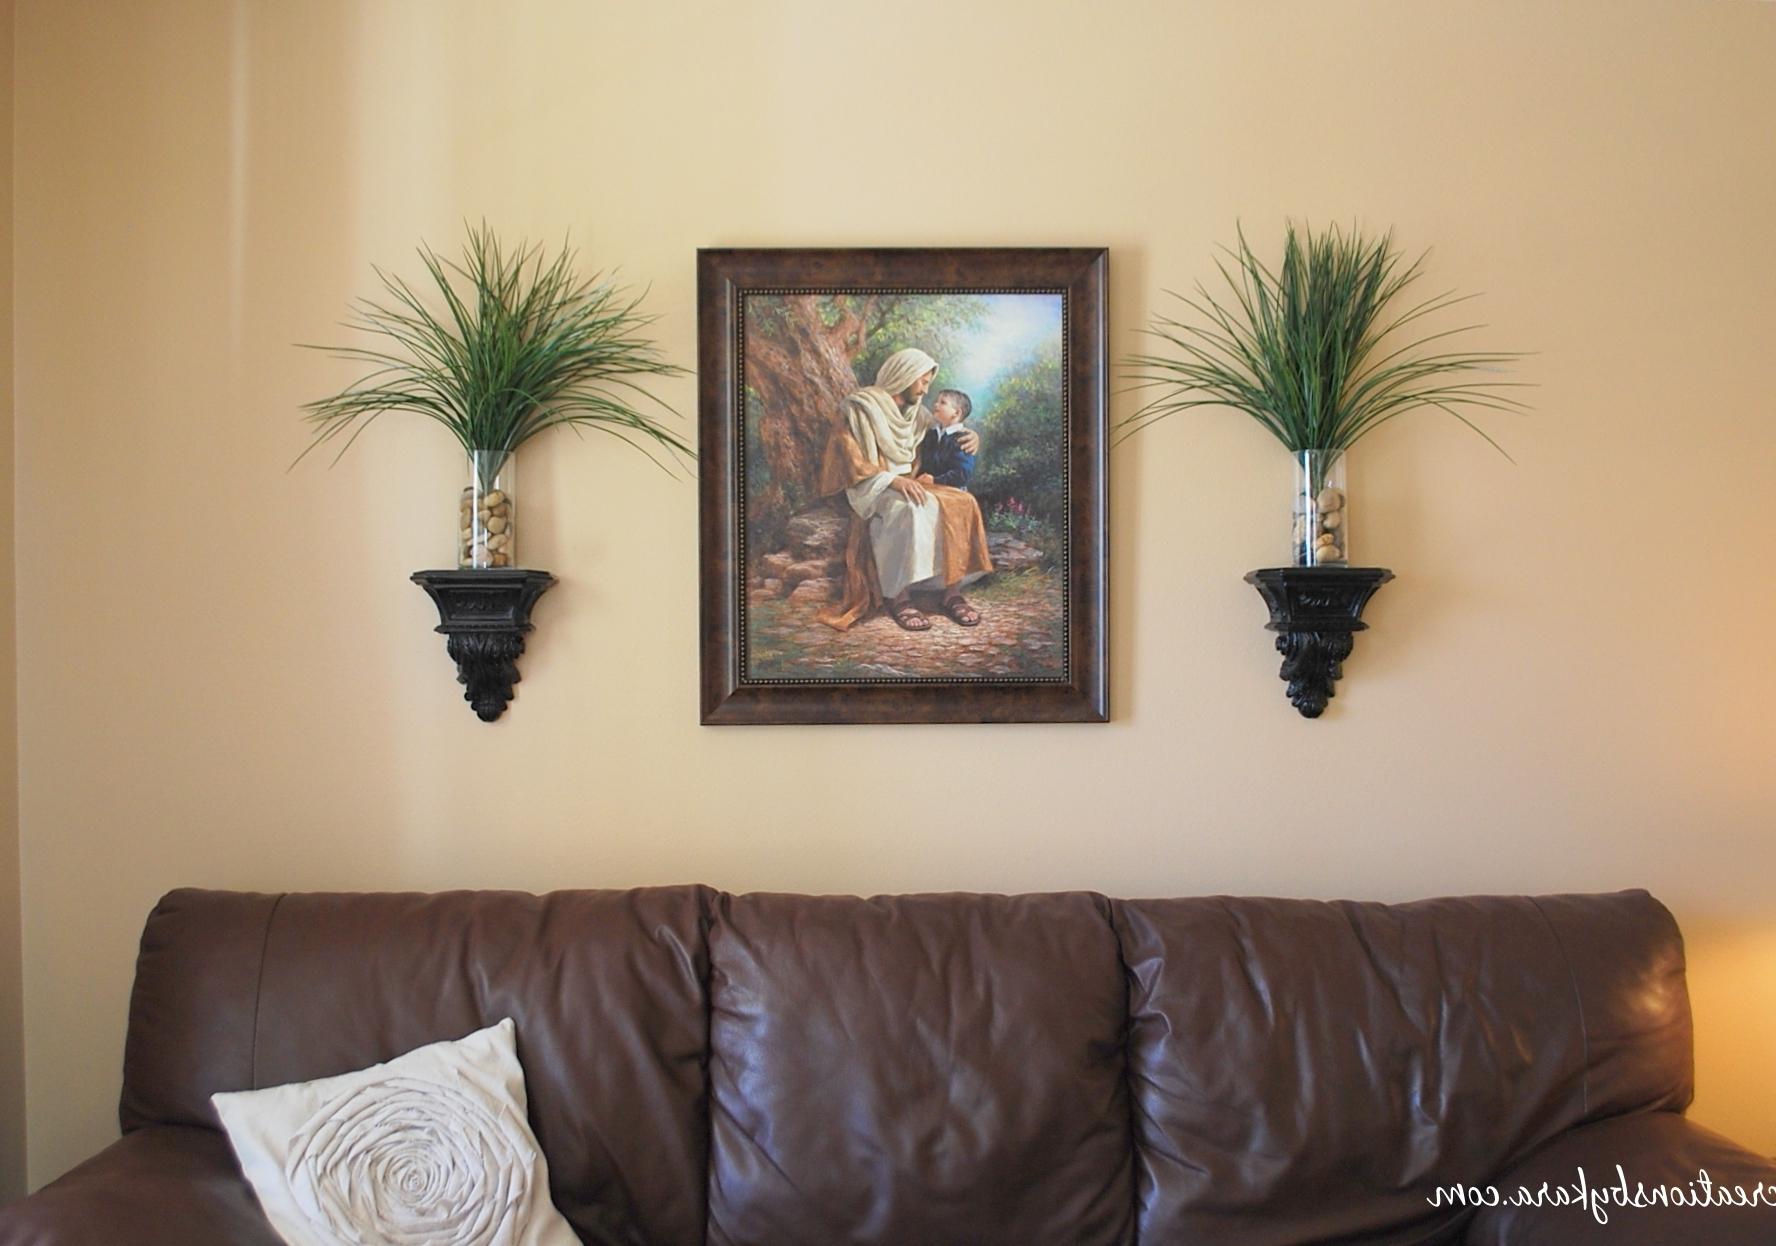 Wall Art Ideas For Living Room Regarding 2018 Decorating Living Room Wall Decor Ideas Big Wall Art For Living Room (View 6 of 15)